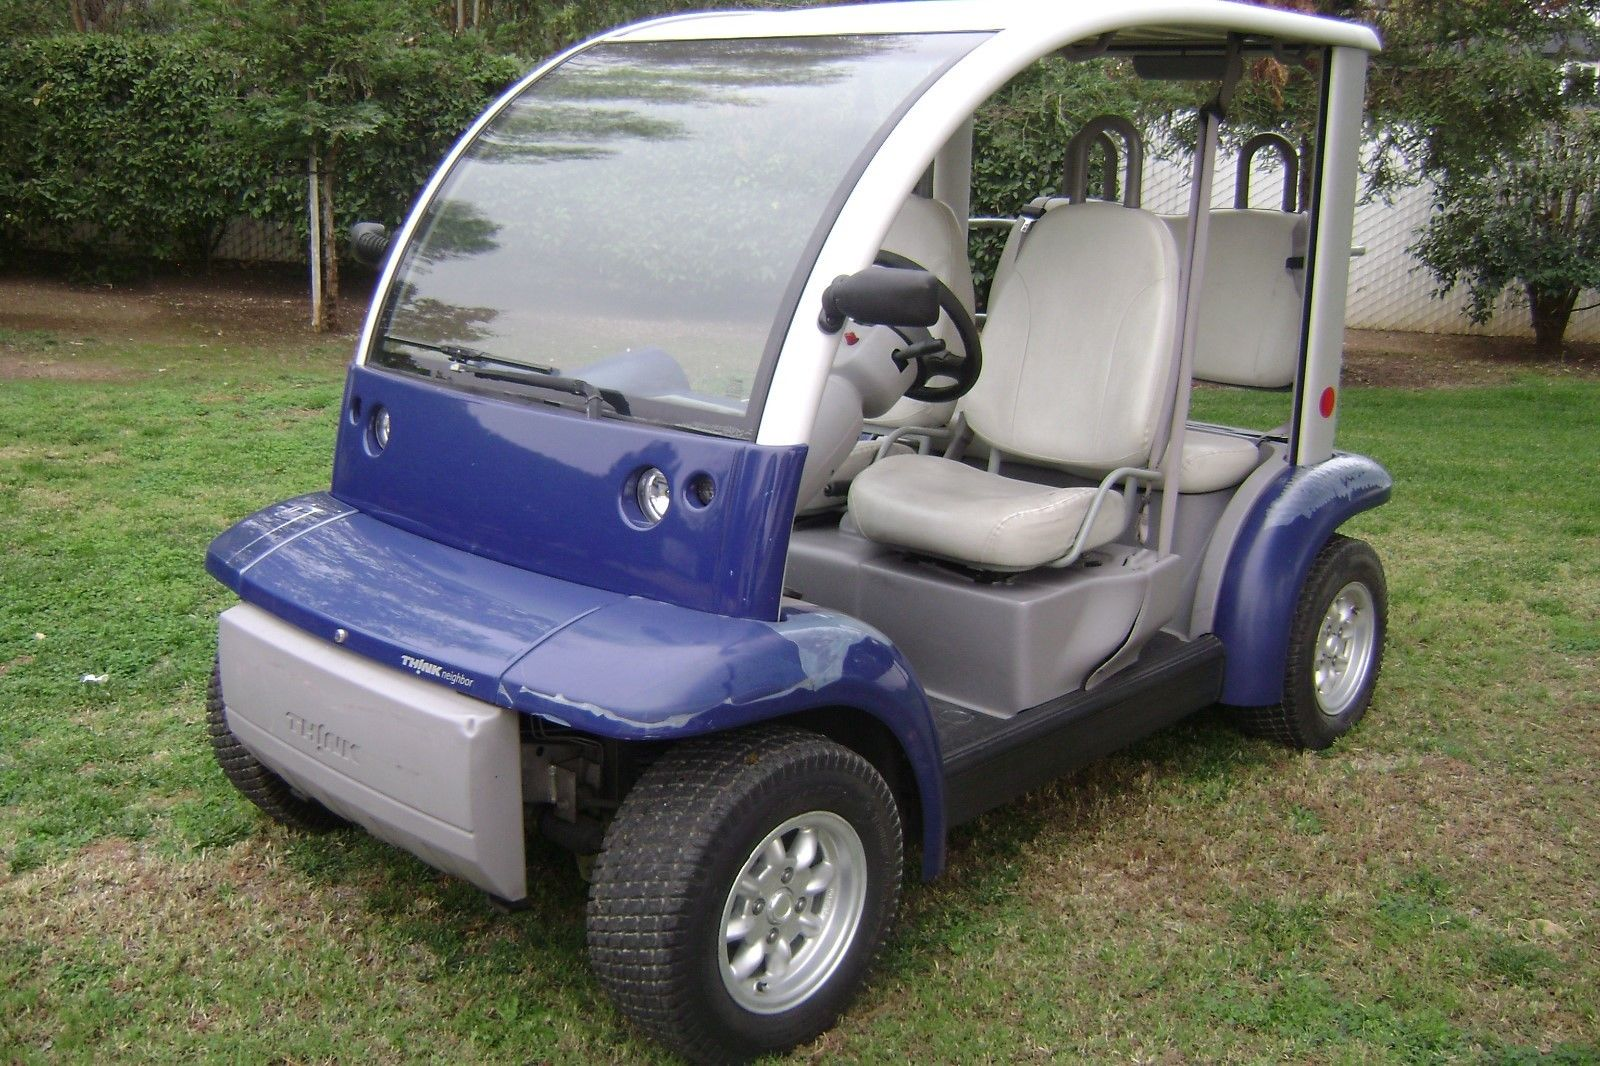 Older Paint 2002 Ford Think 4 Passenger Golf Cart For Sale